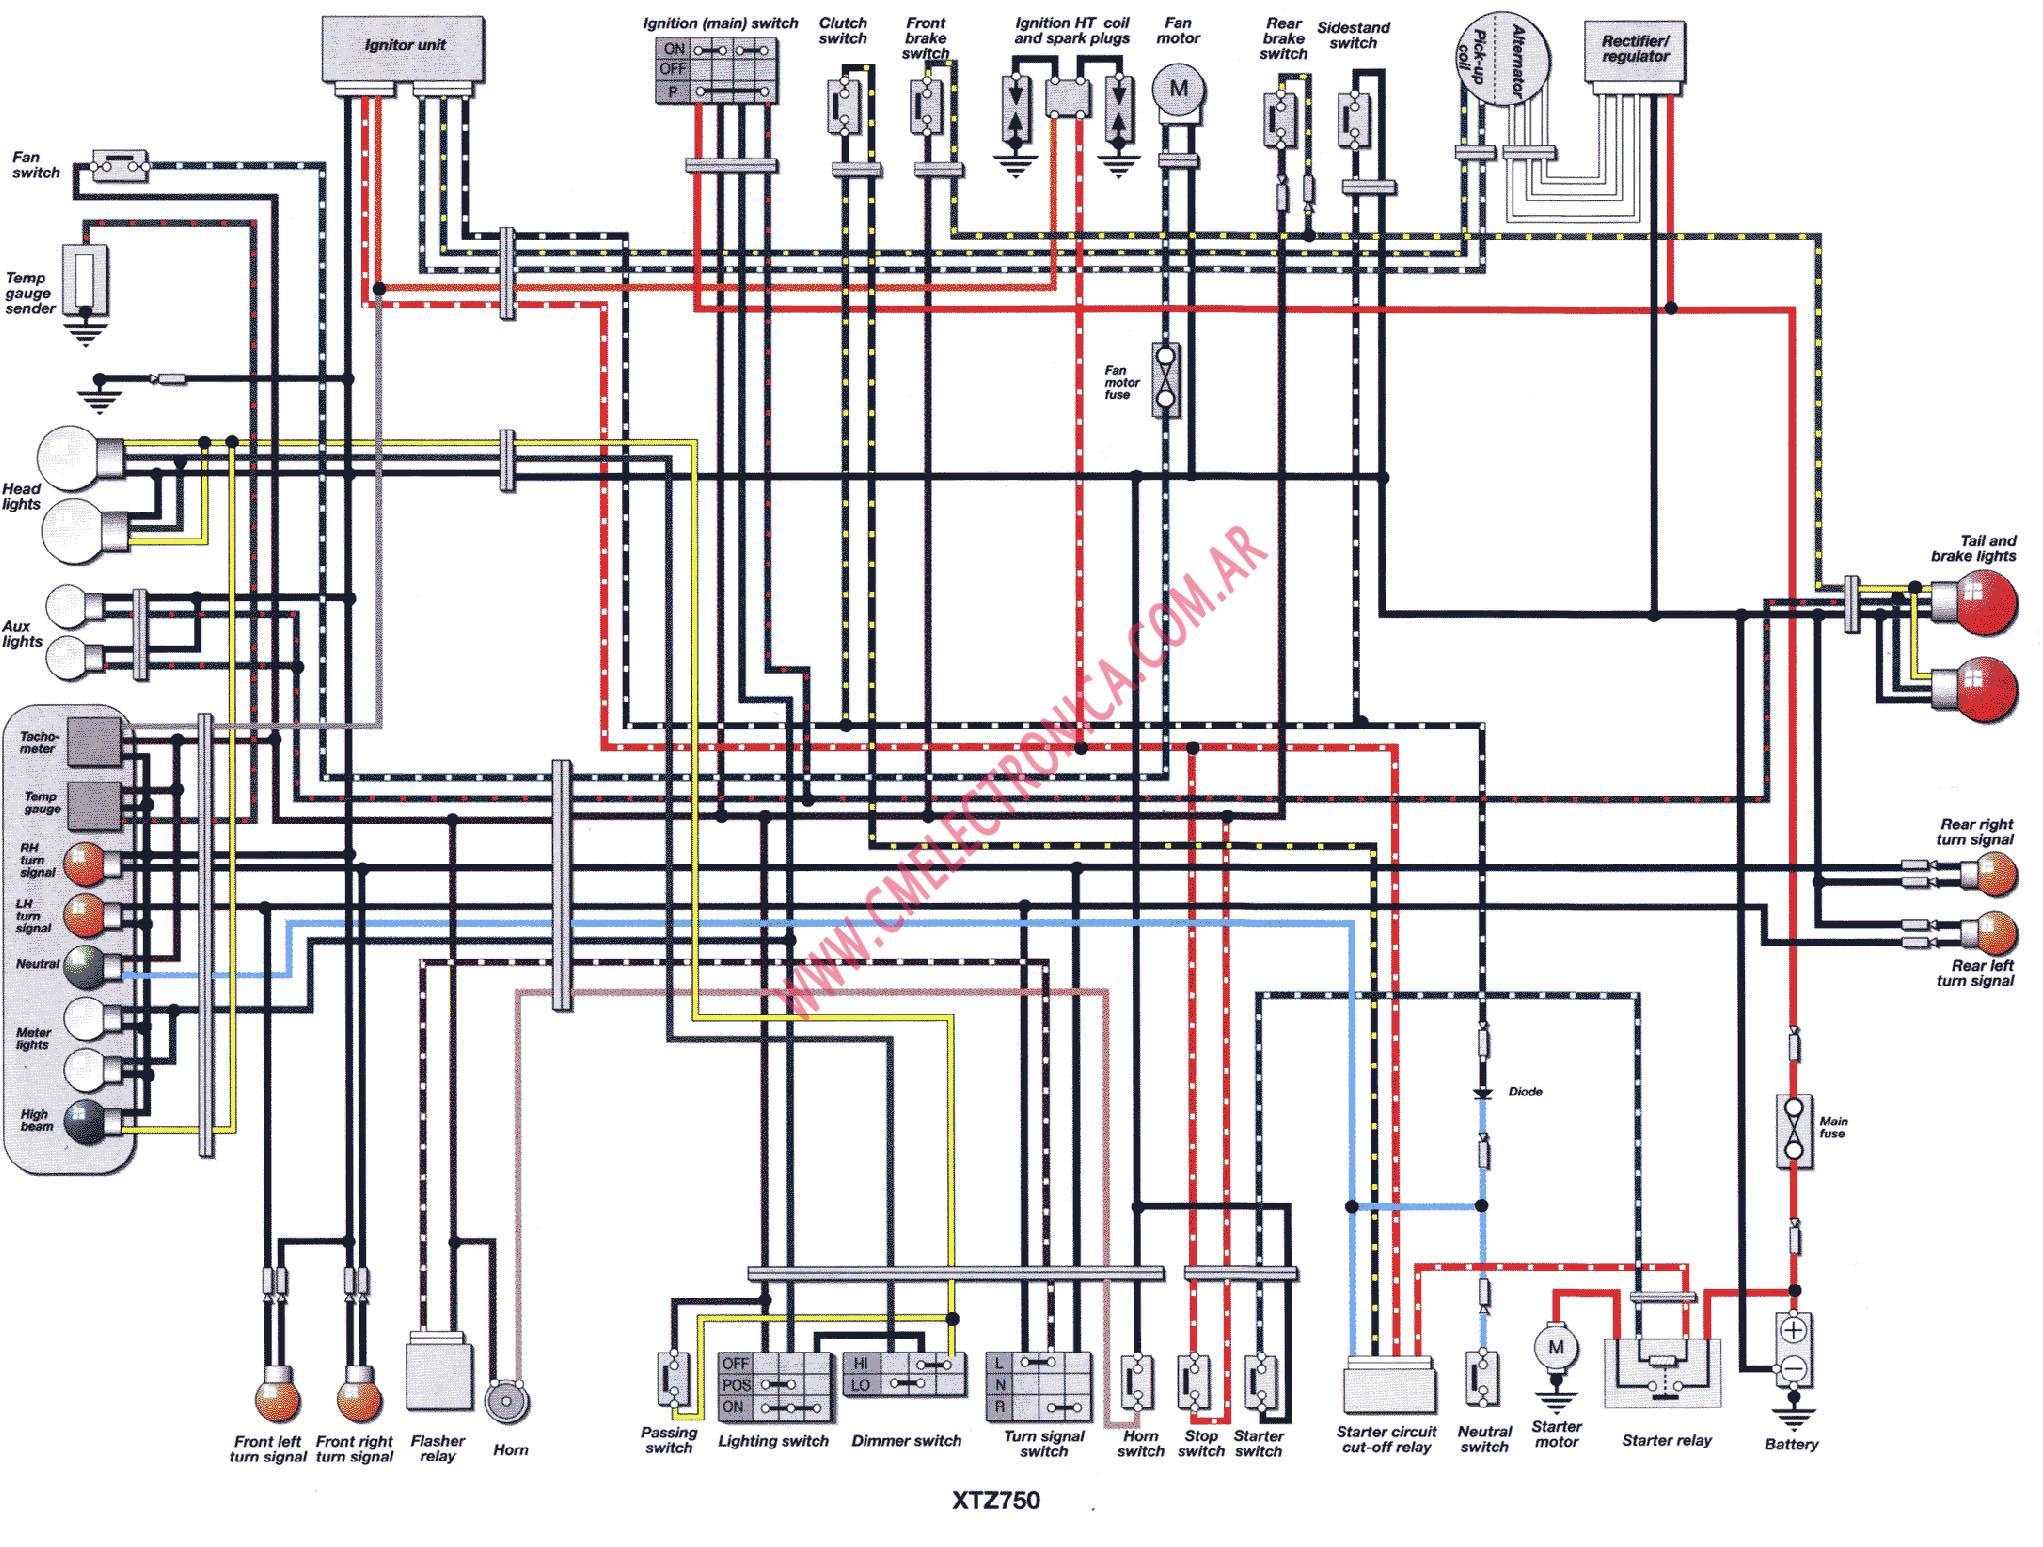 yamaha timberwolf wiring schematic ignition atv timberwolf 250 wiring diagram chinese 110cc atv wiring #2